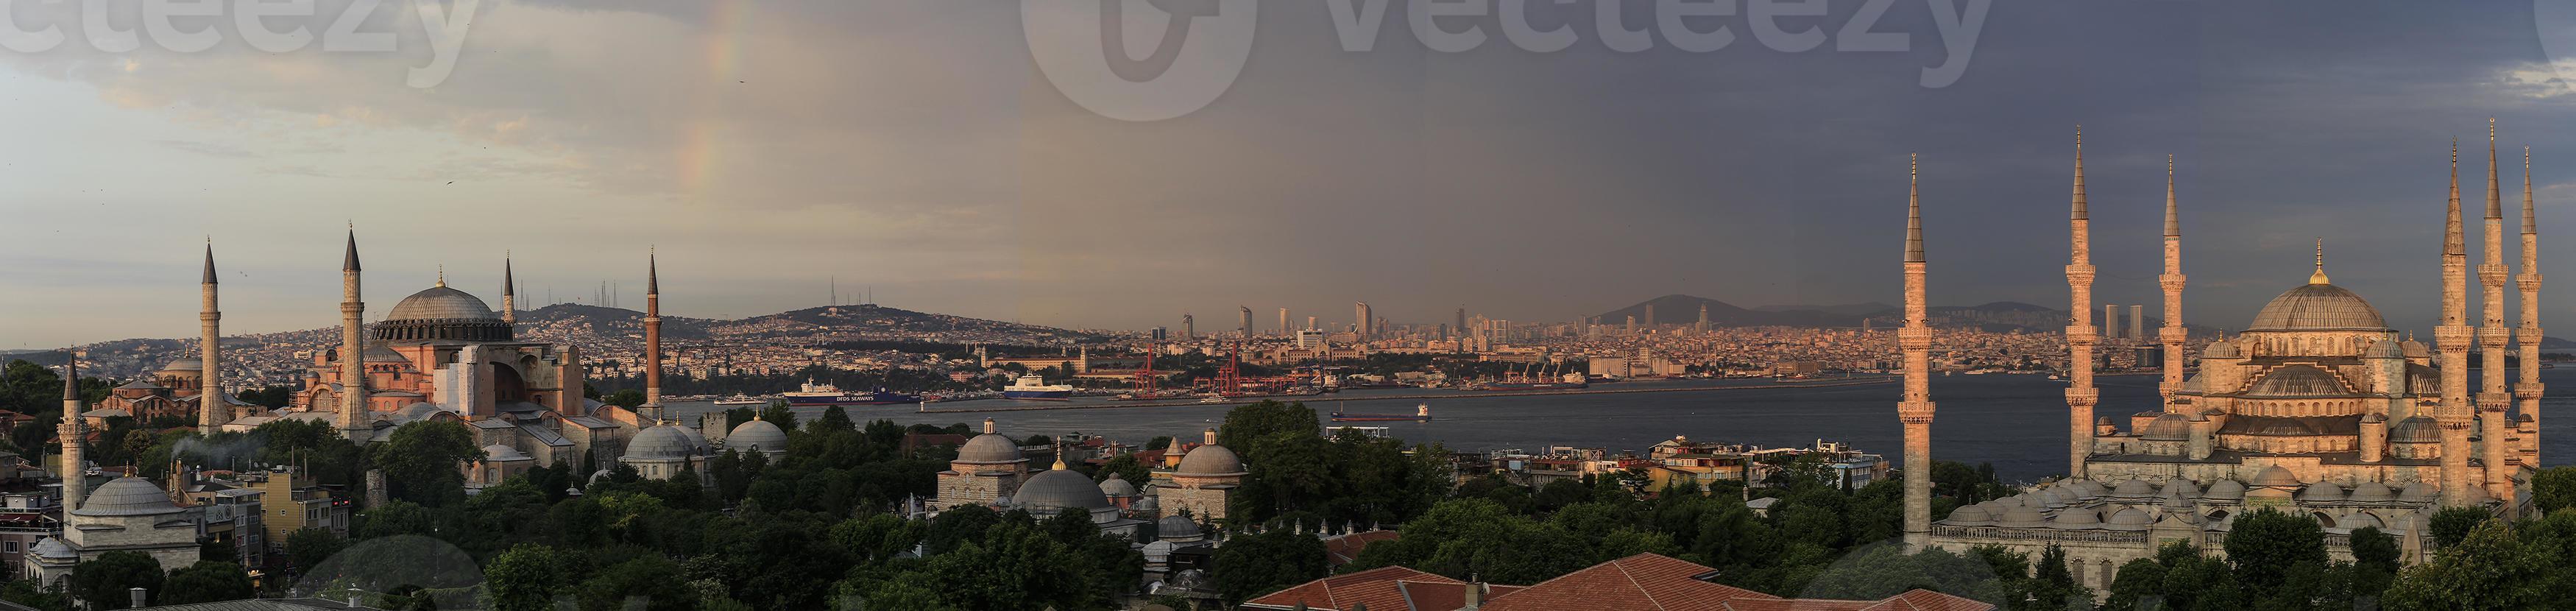 Sultan-Ahmet-Moschee und Hagia Sofia foto